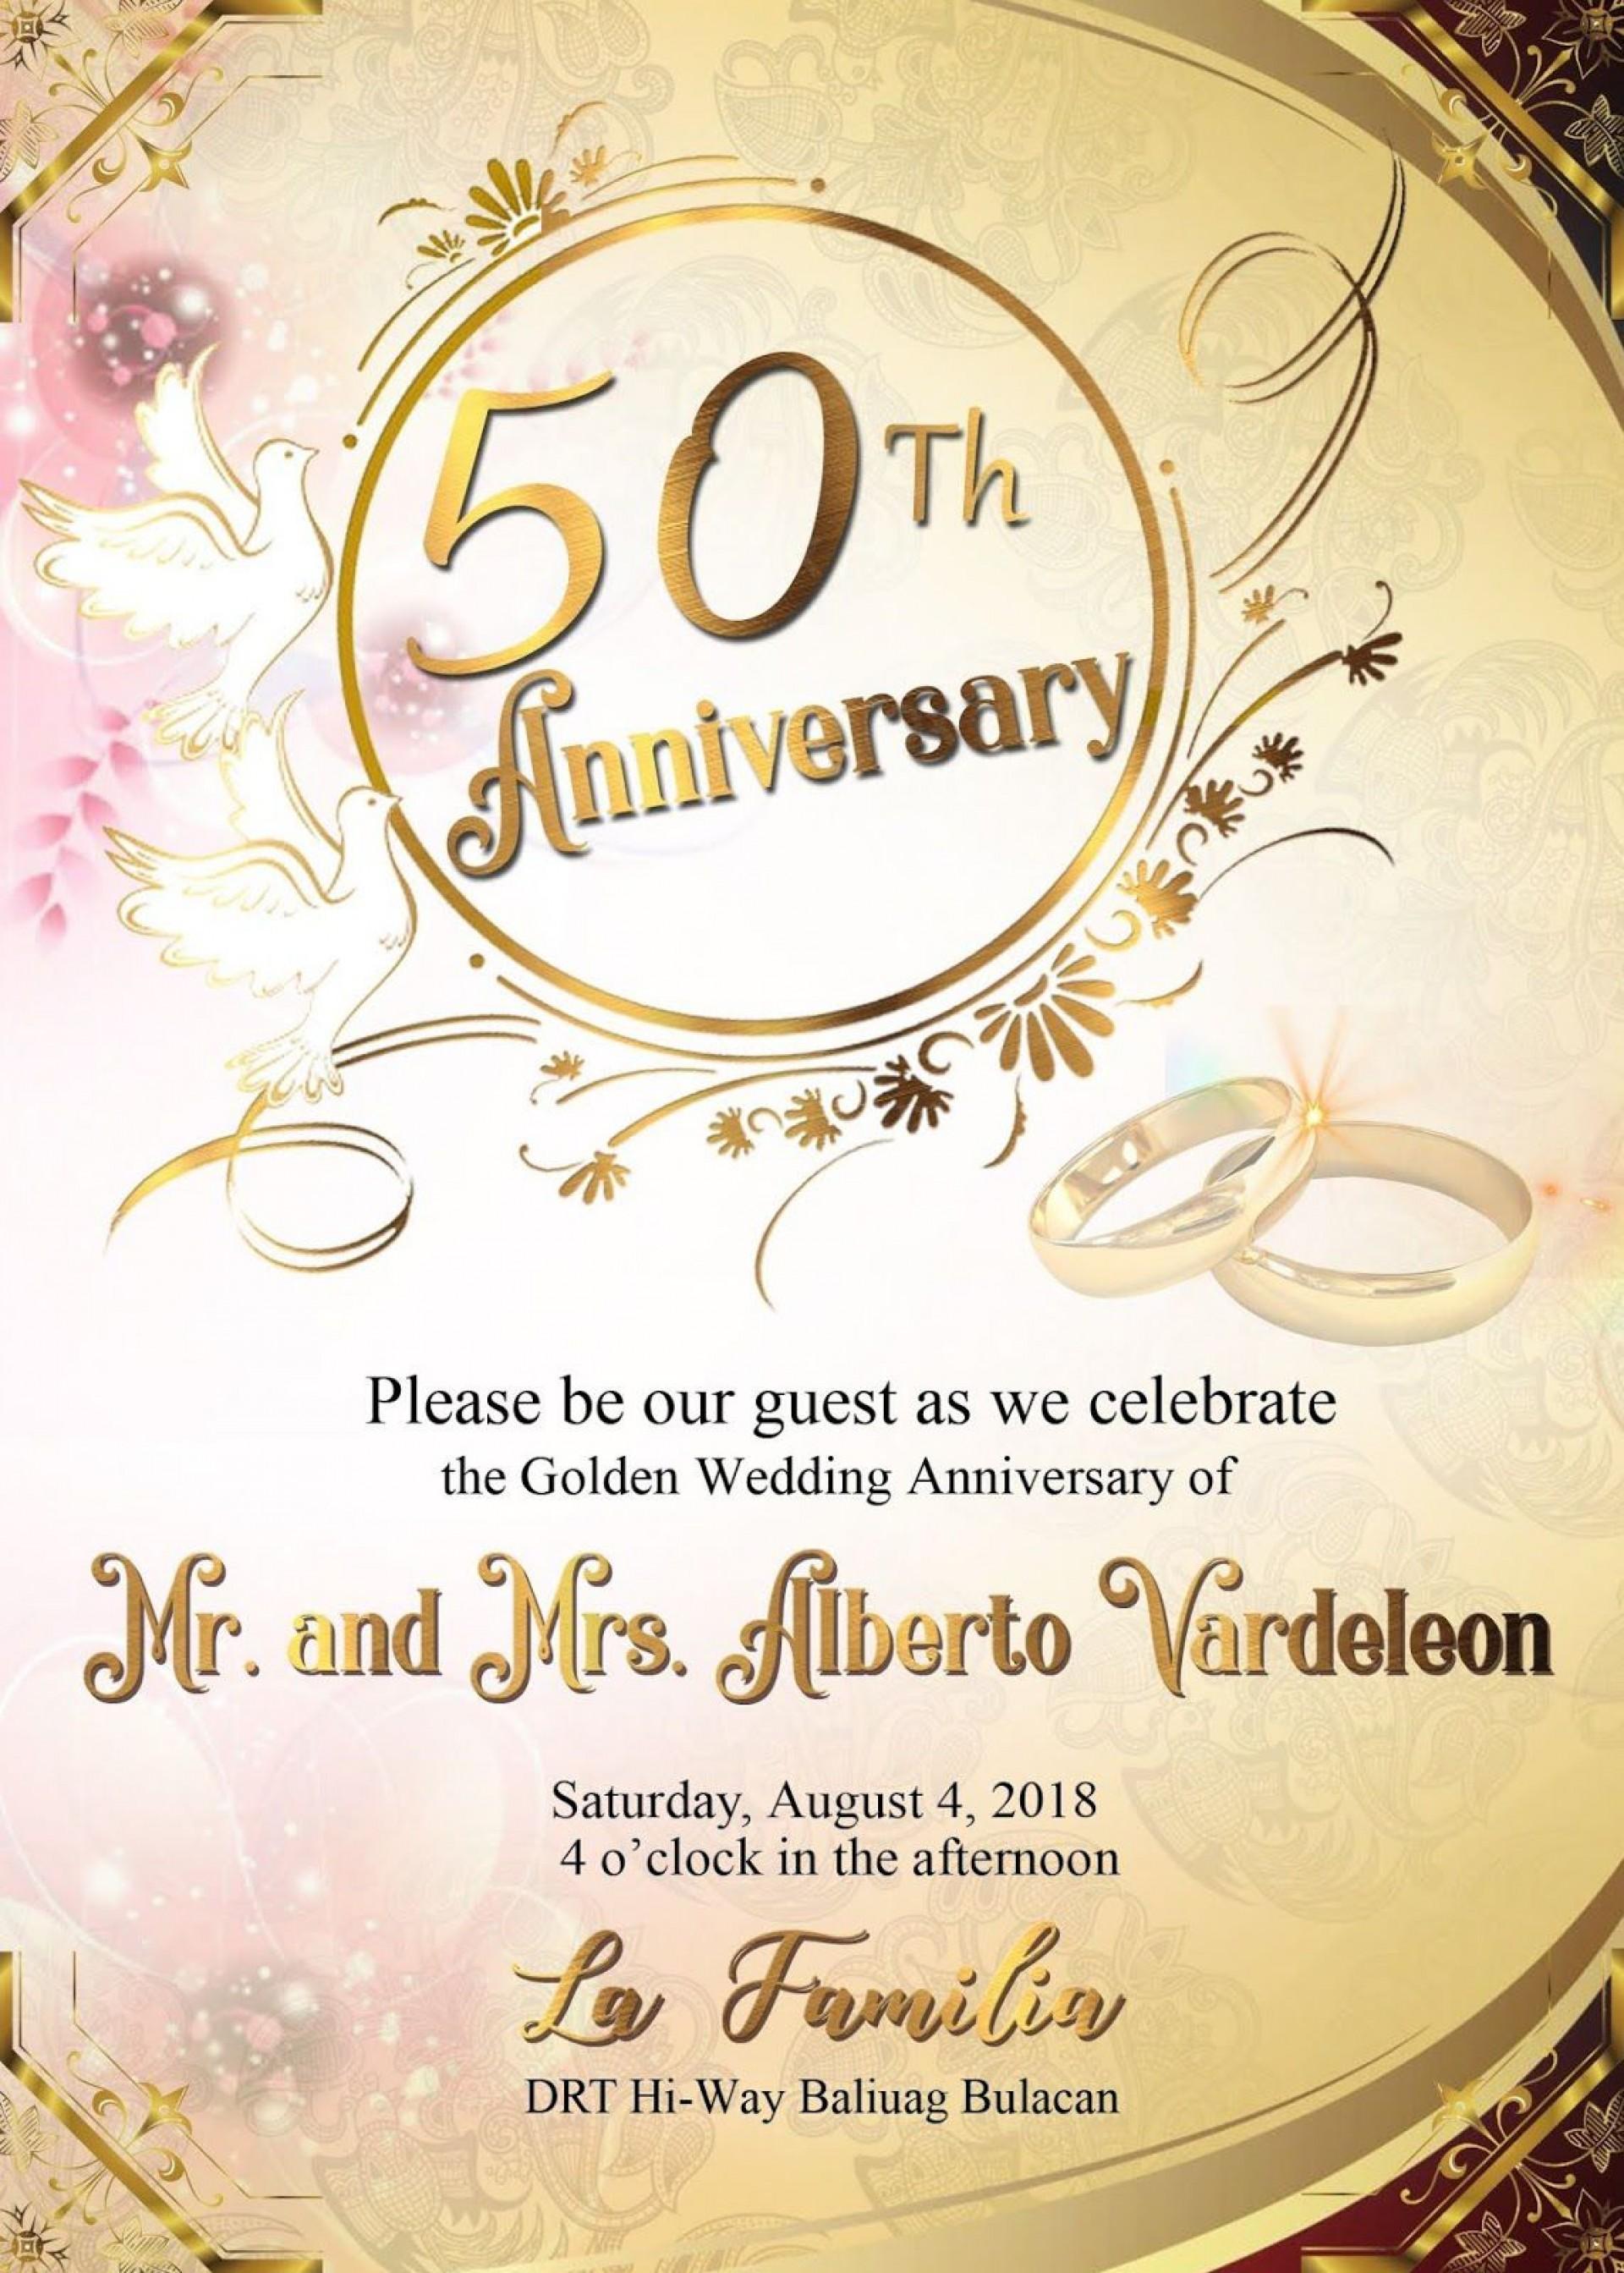 007 Impressive 50th Wedding Anniversary Invitation Sample High Resolution  Samples Free Party Template Card Idea1920